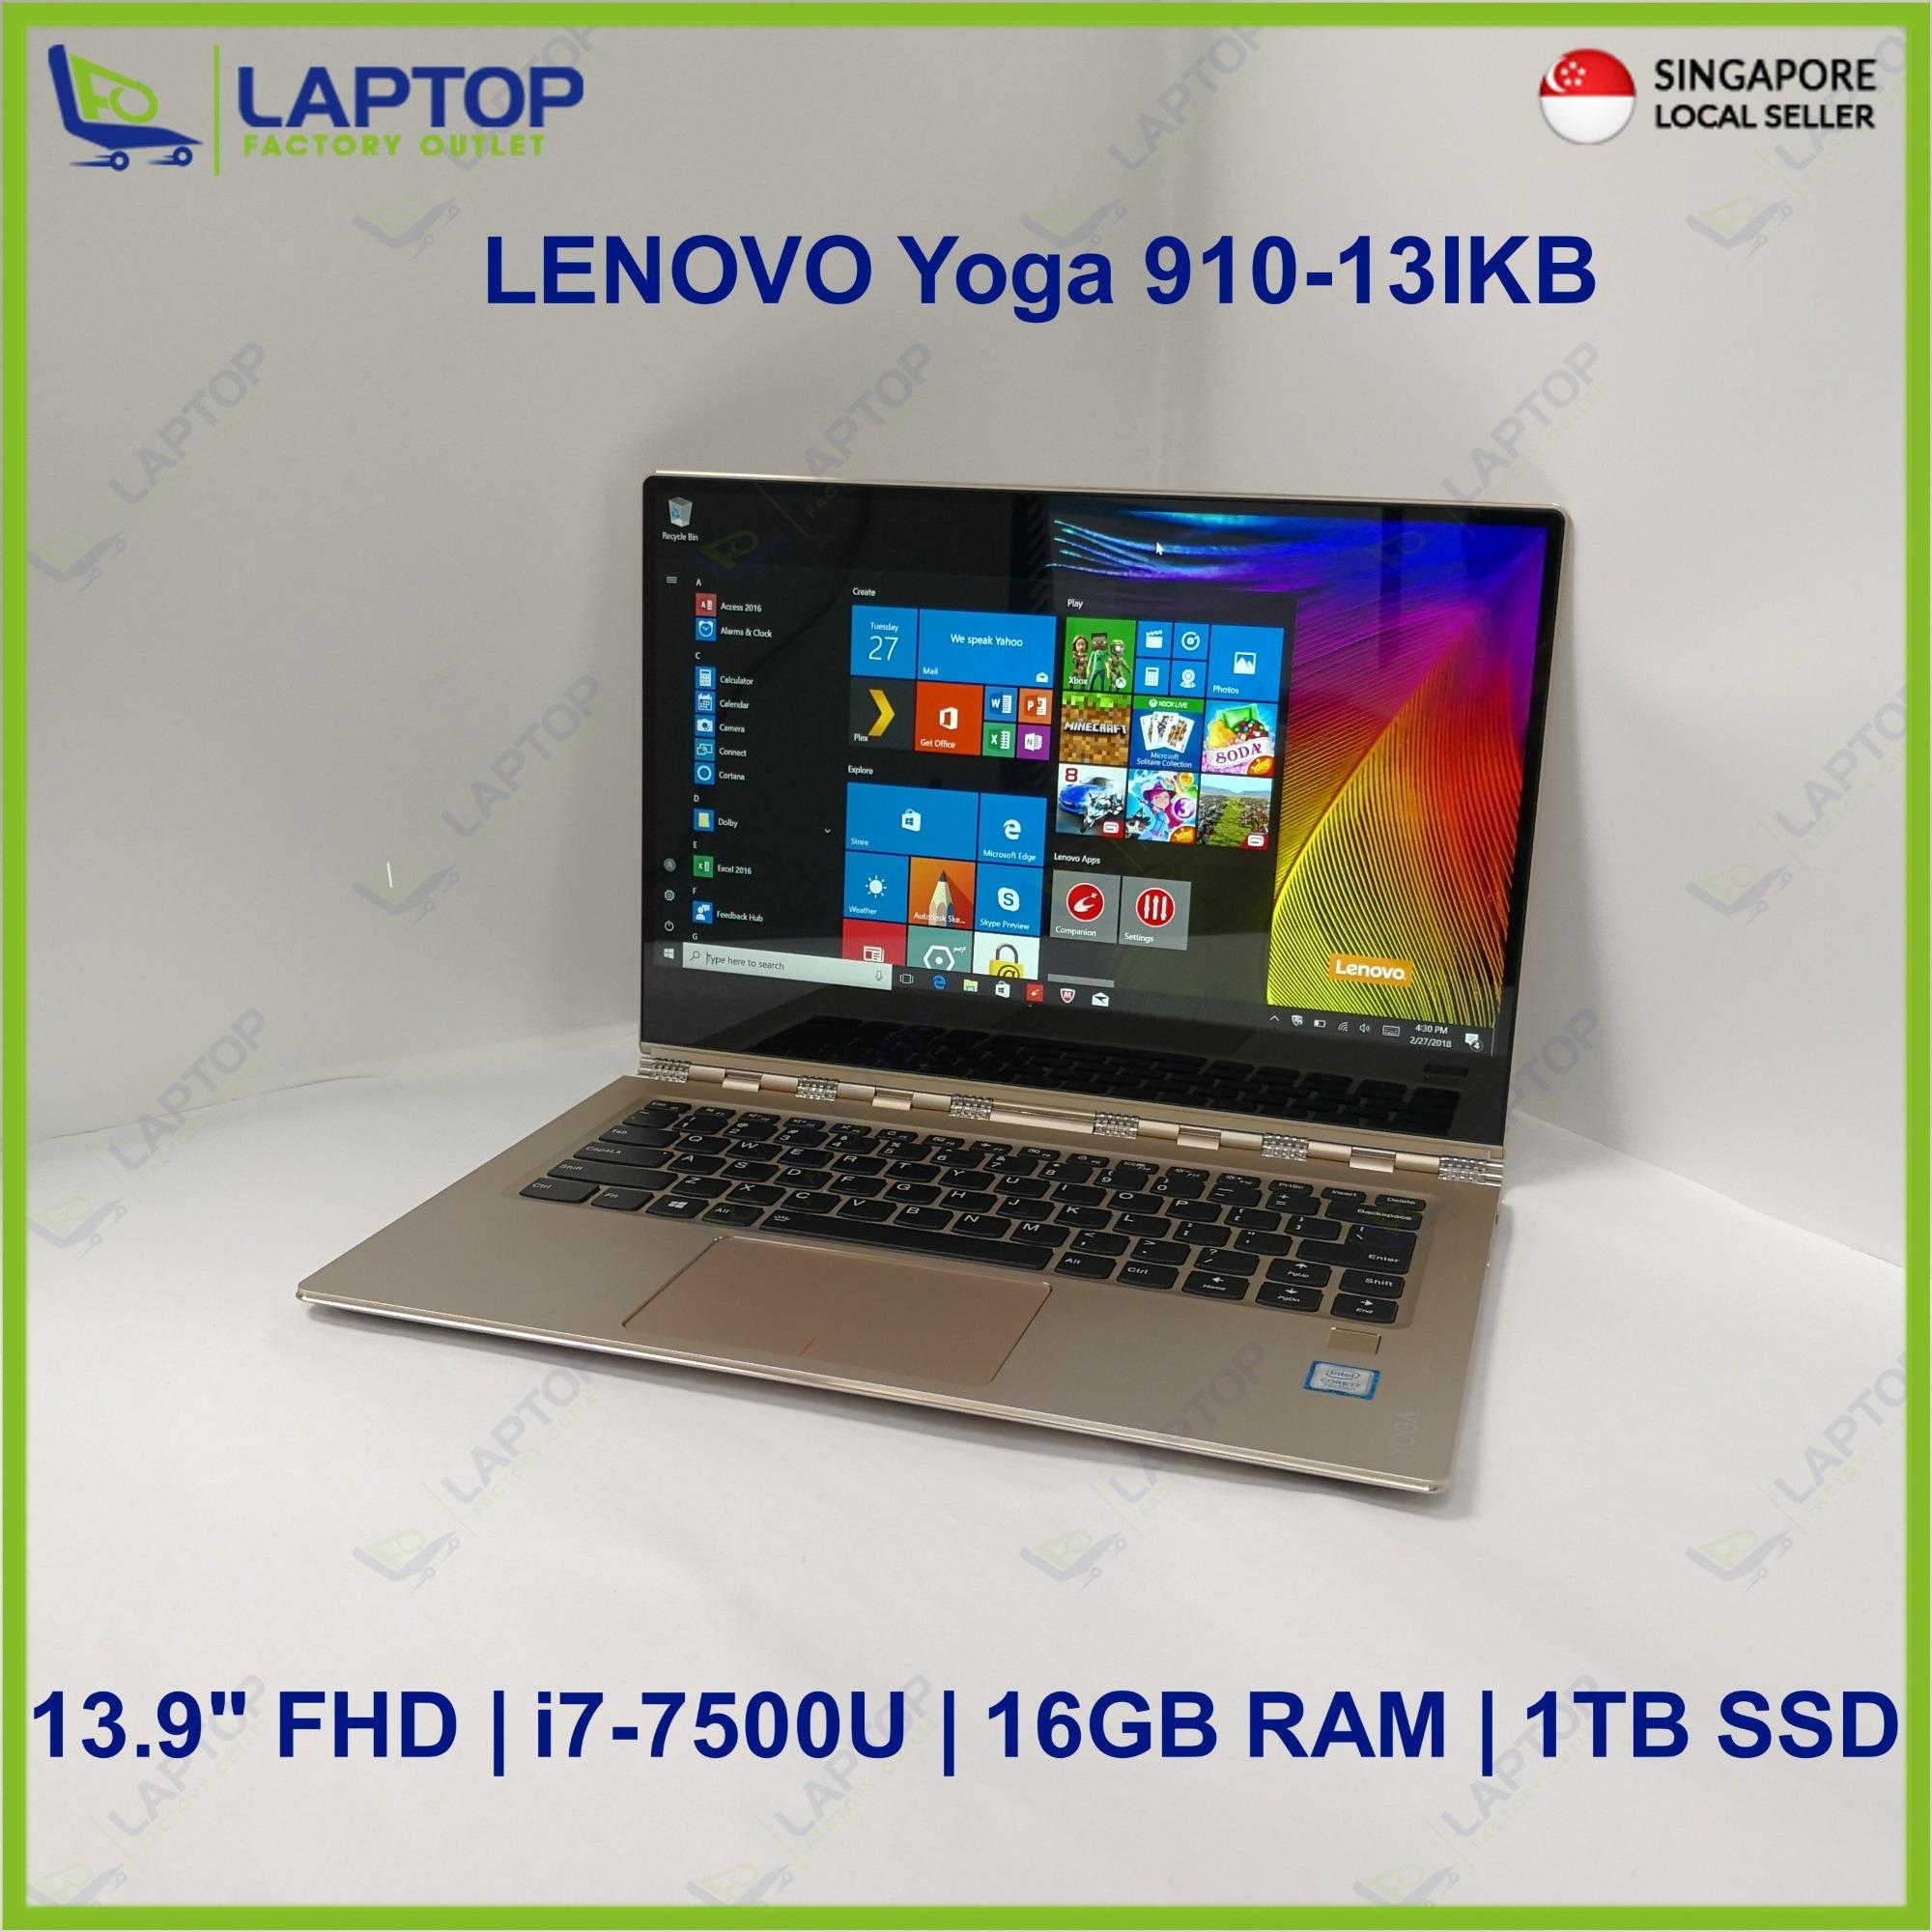 LENOVO Yoga 910-13IKB Touch Screen (i7-7/16GB/1TB SSD) @Light Original Warranty@ Preowned [Refurbished]